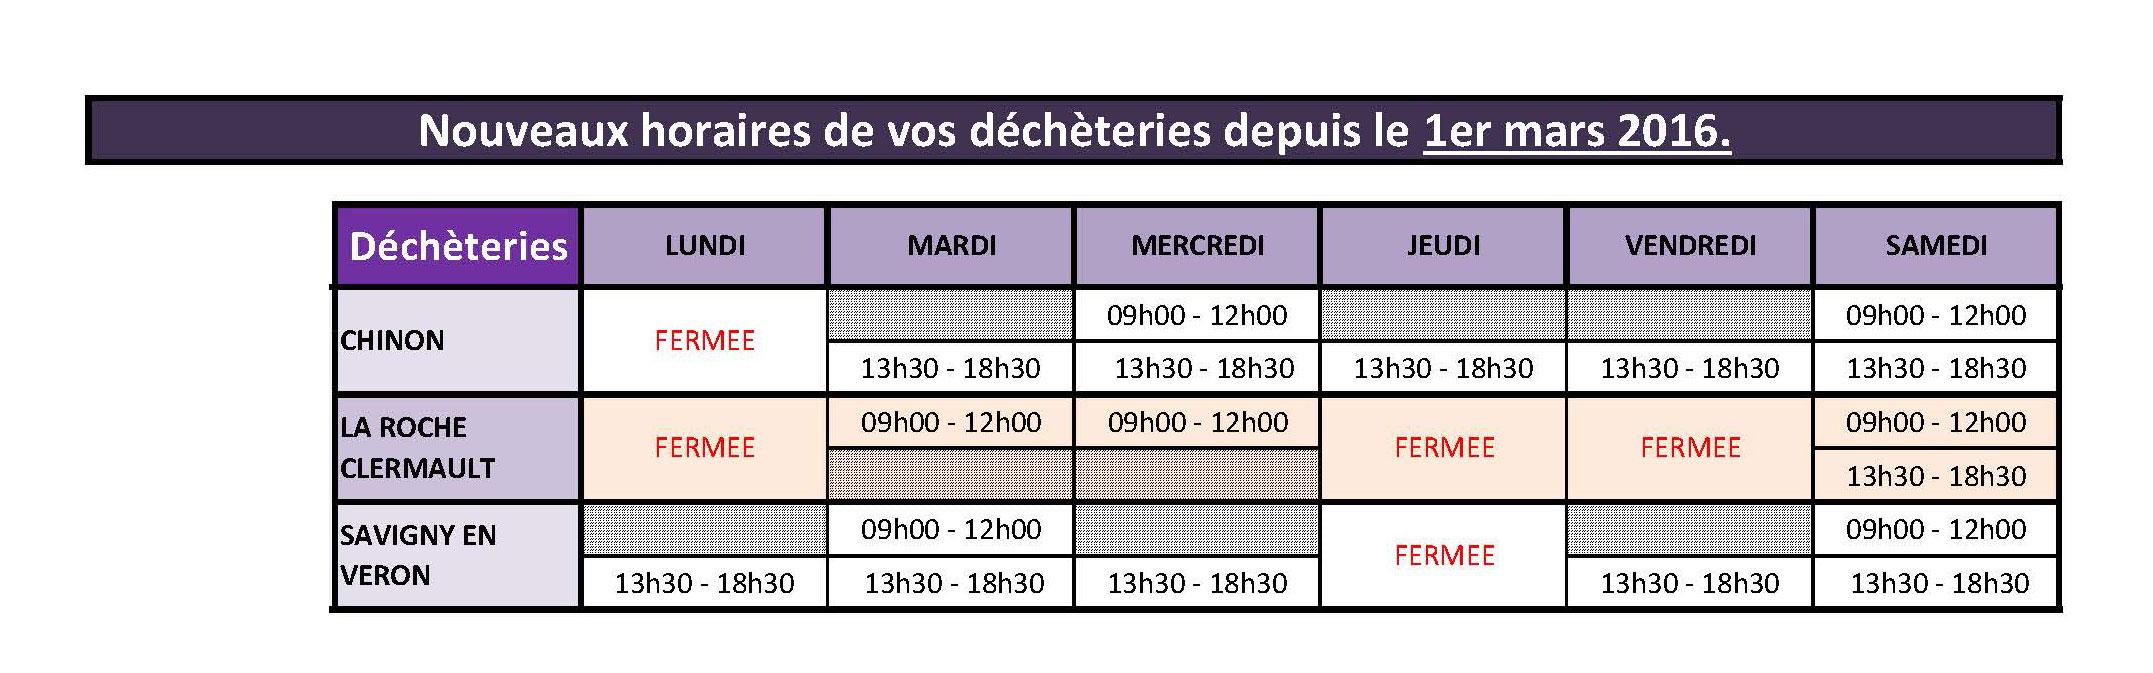 horaires decheteries